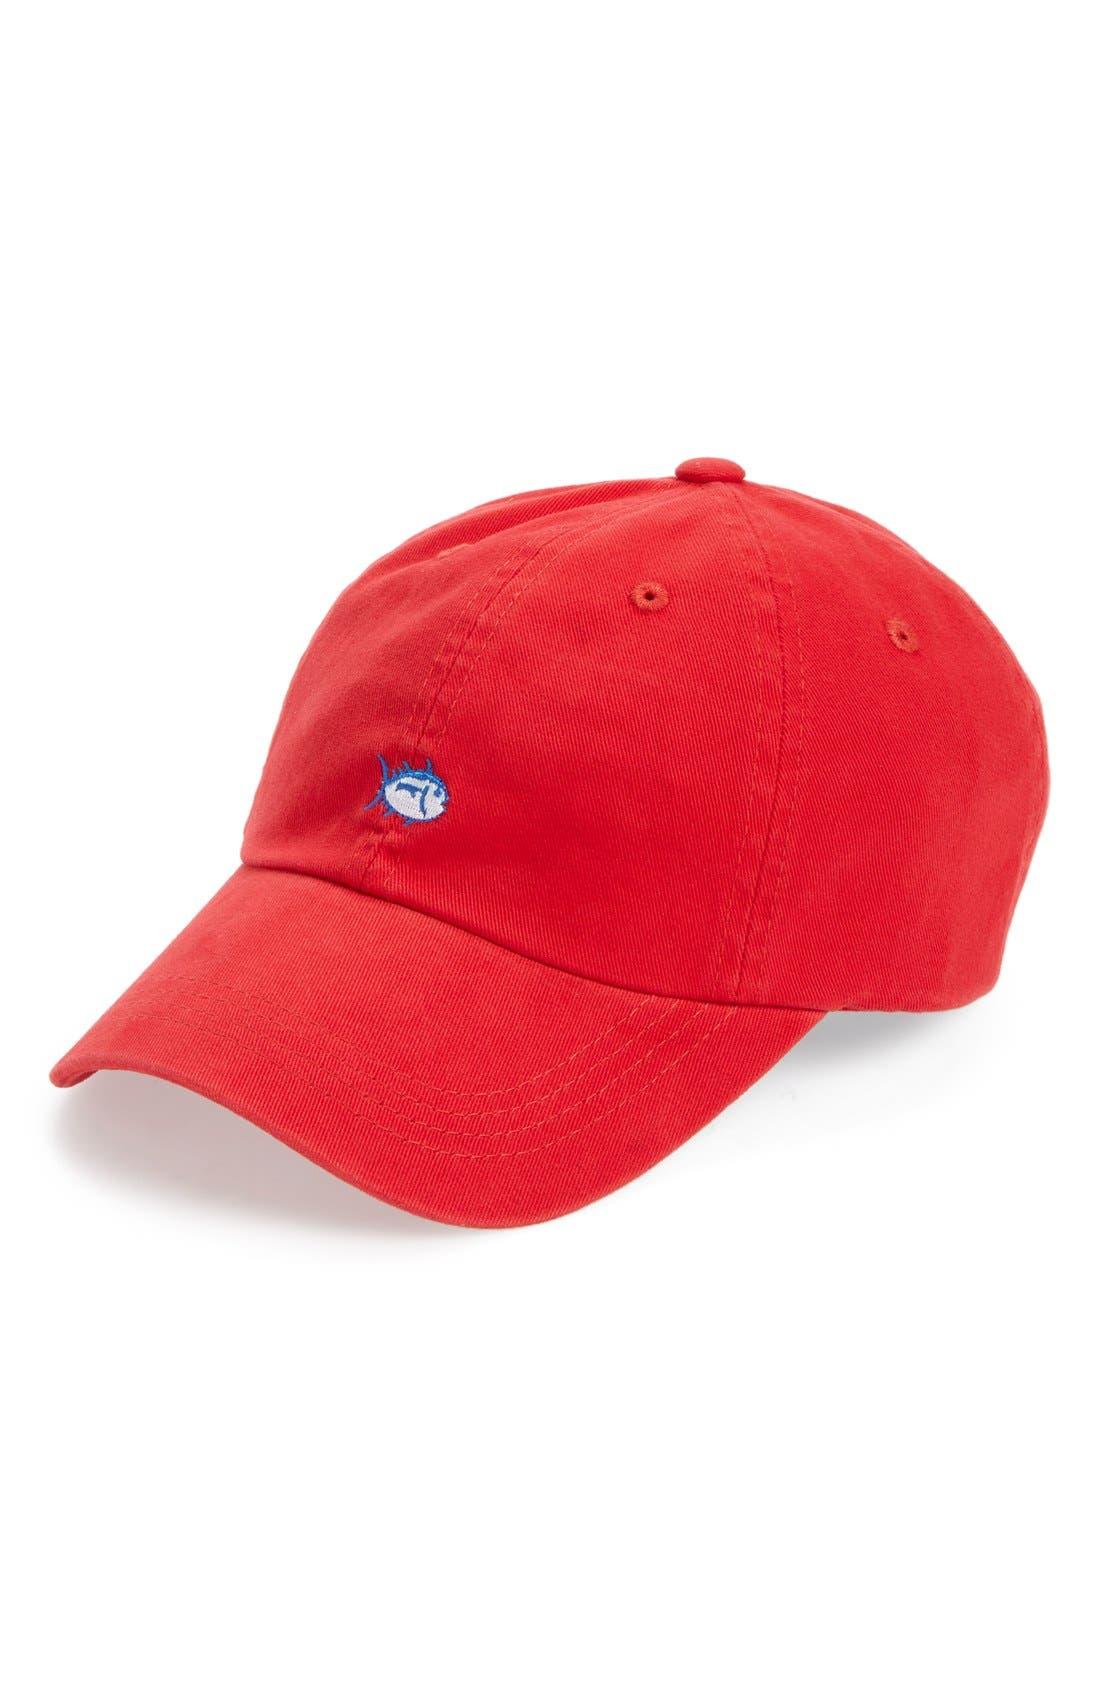 Main Image - Southern Tide 'Mini Skipjack' Baseball Cap